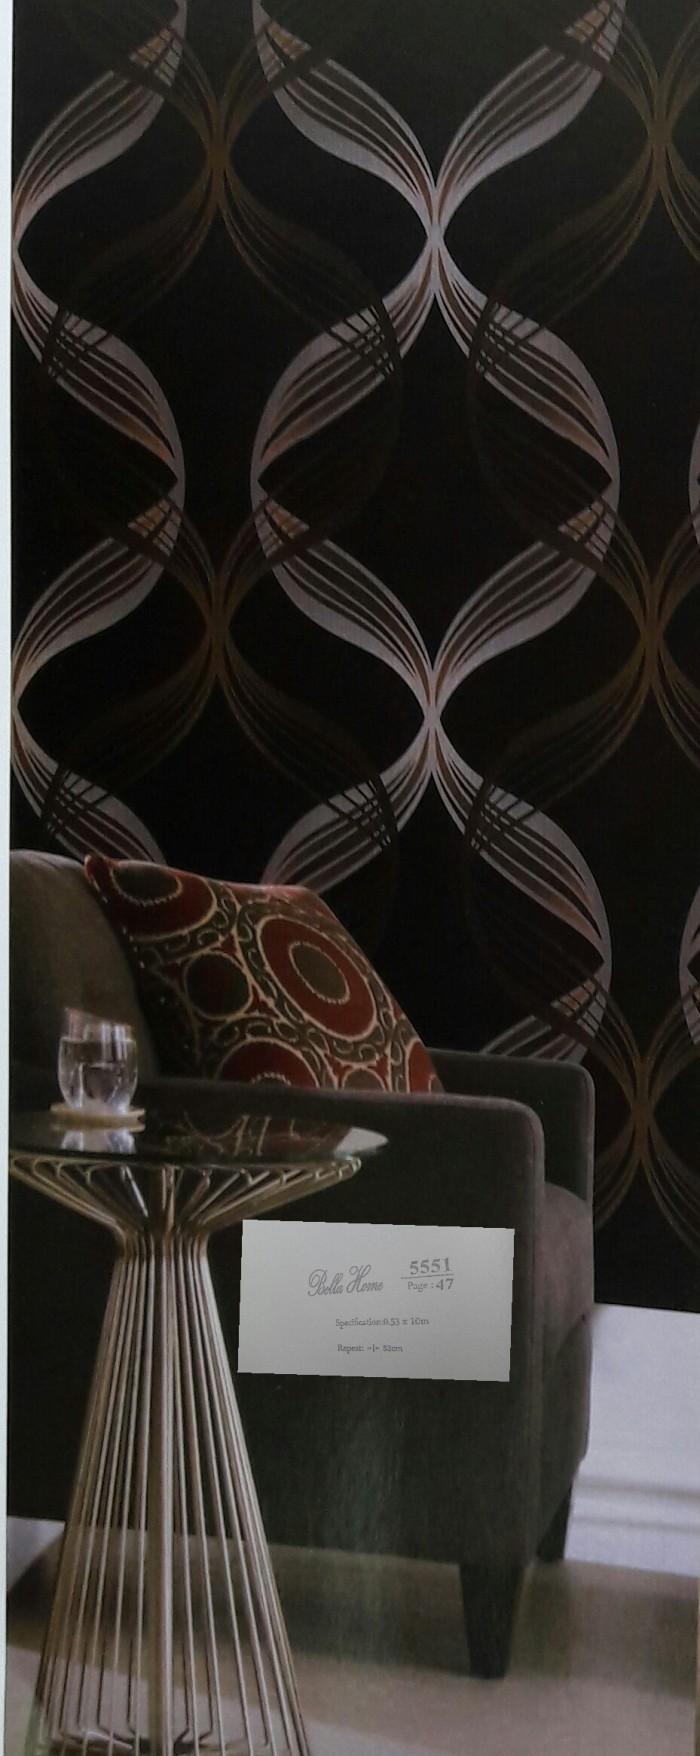 Jual Wallpaper Minimalis Warna Hitam Gold Coklat Kembar Makmur